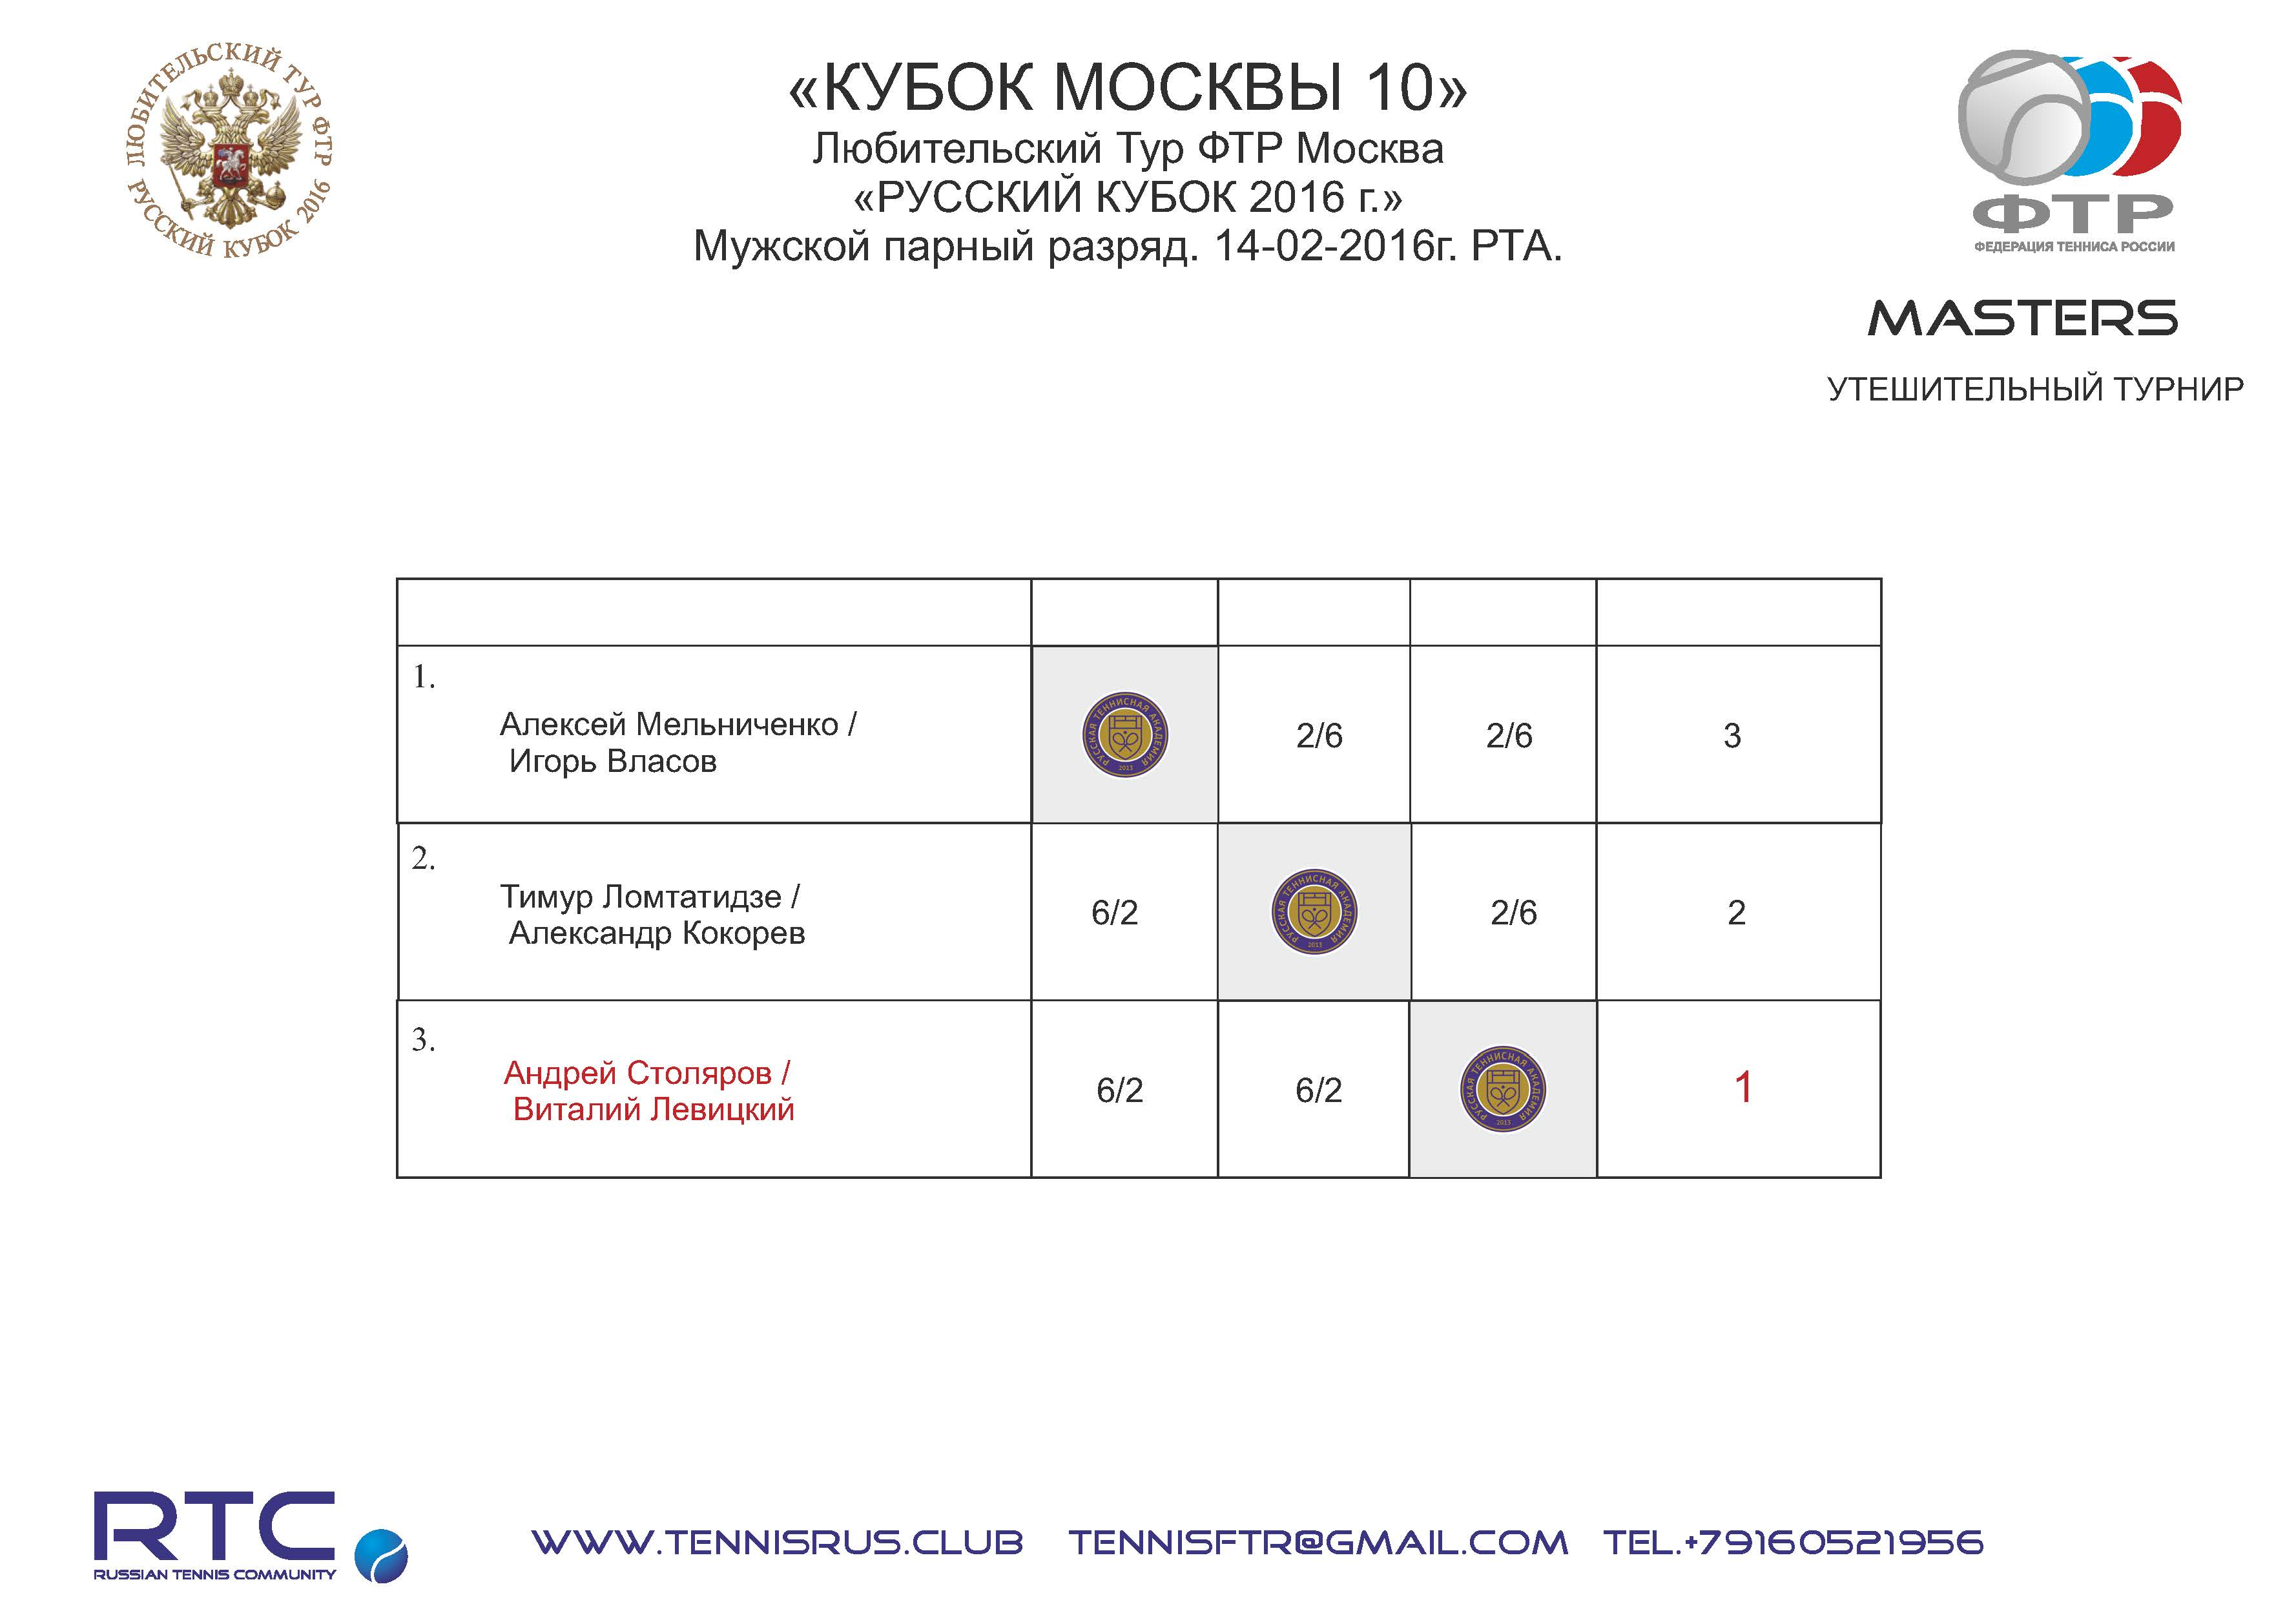 MC 10 2016 mens pairs Masters NET s dop